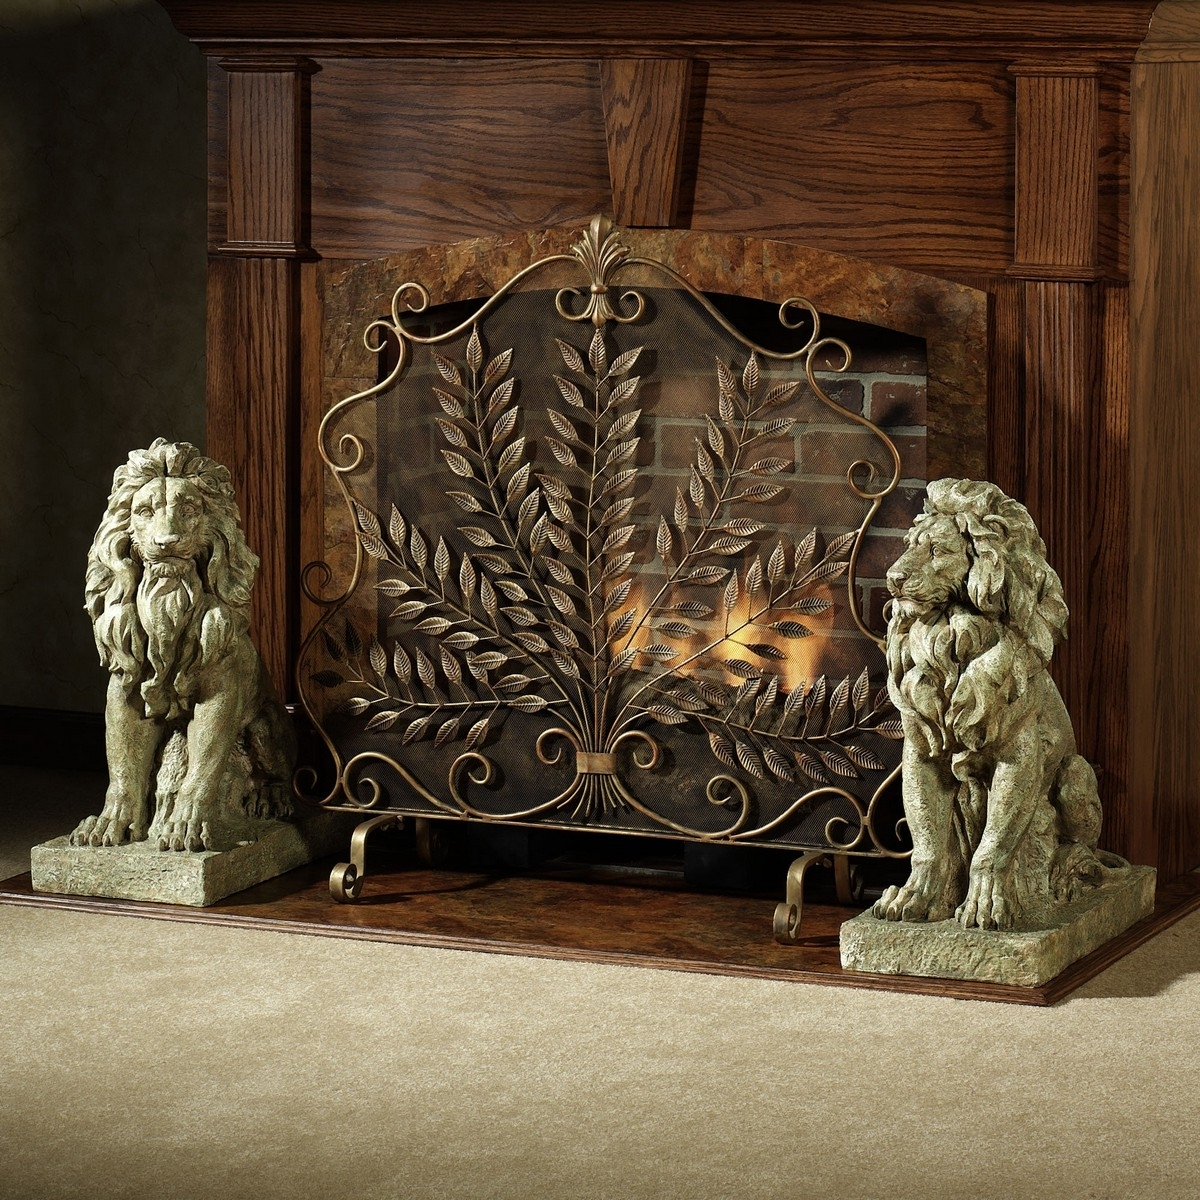 Madison Art Center Design: Classic Wrought Iron Fireplace Screens